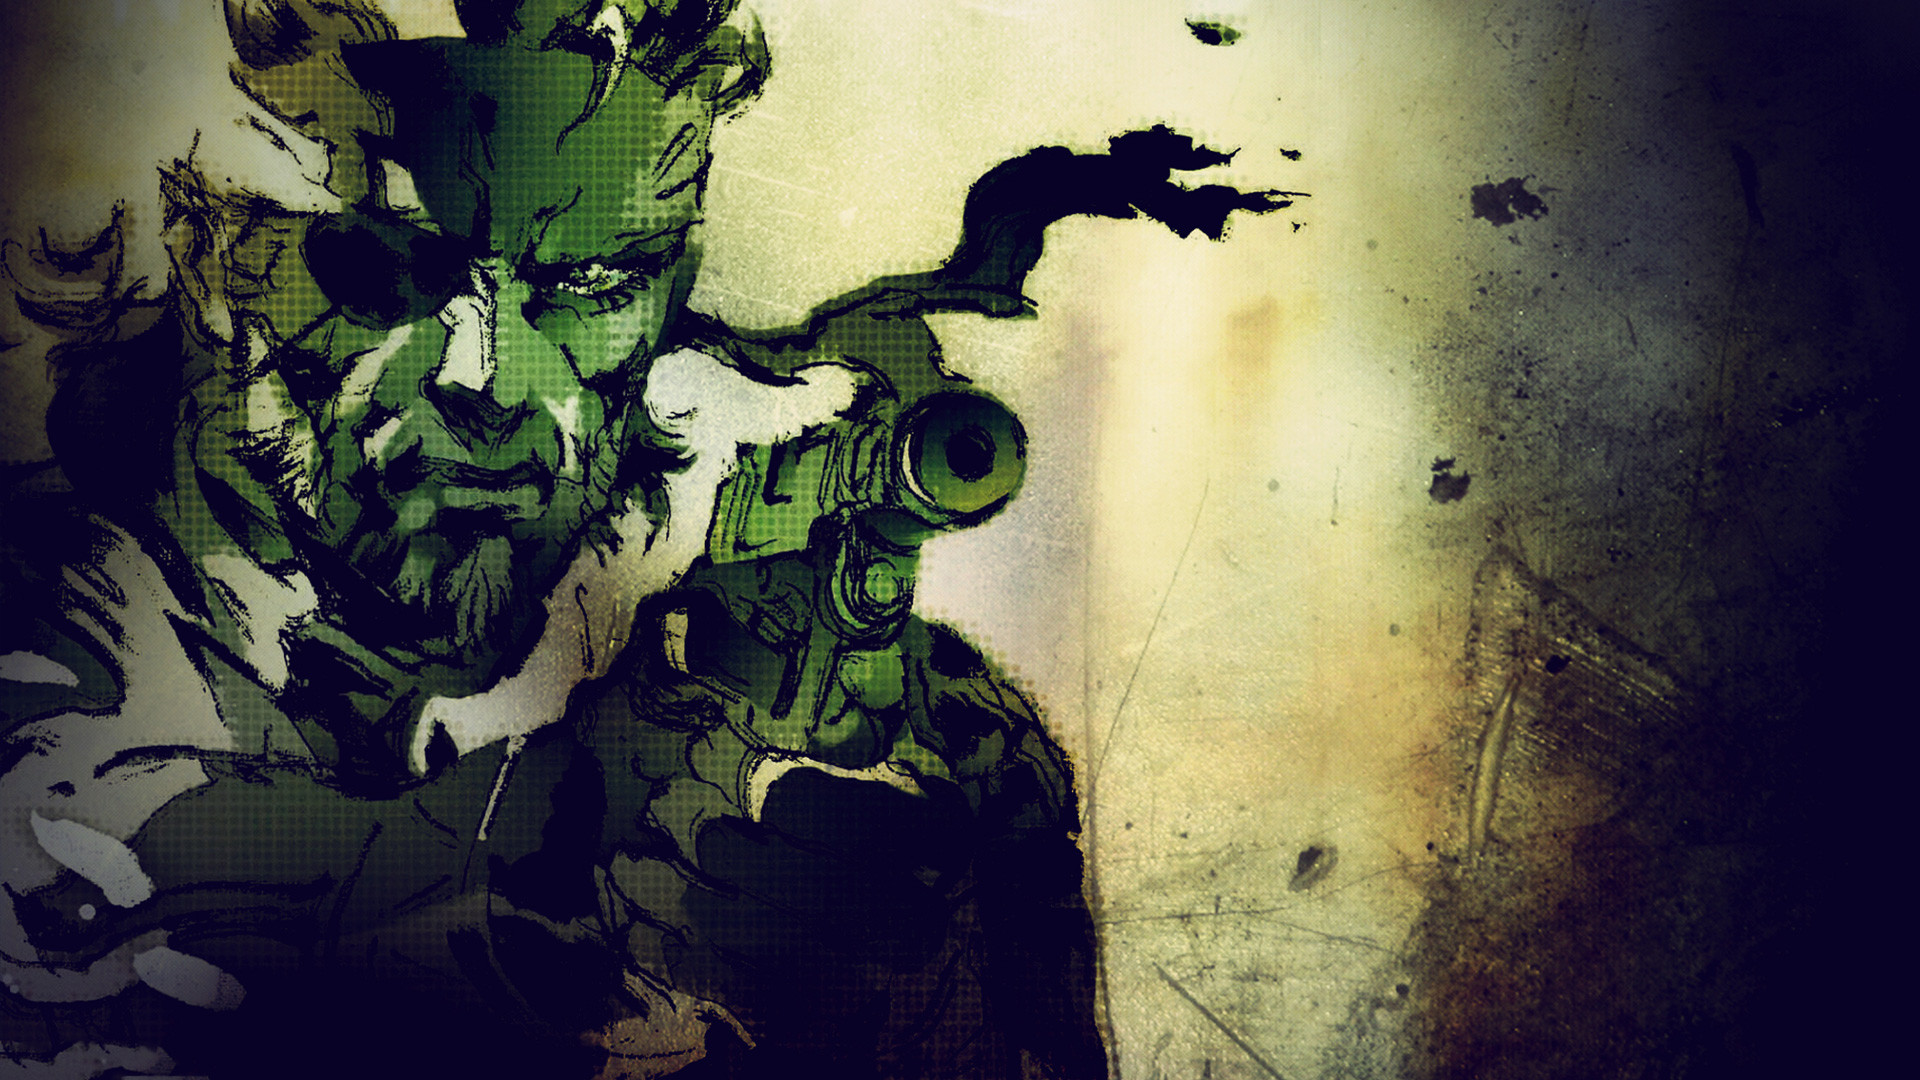 Video Game – Metal Gear Solid Snake Metal Gear Solid Wallpaper